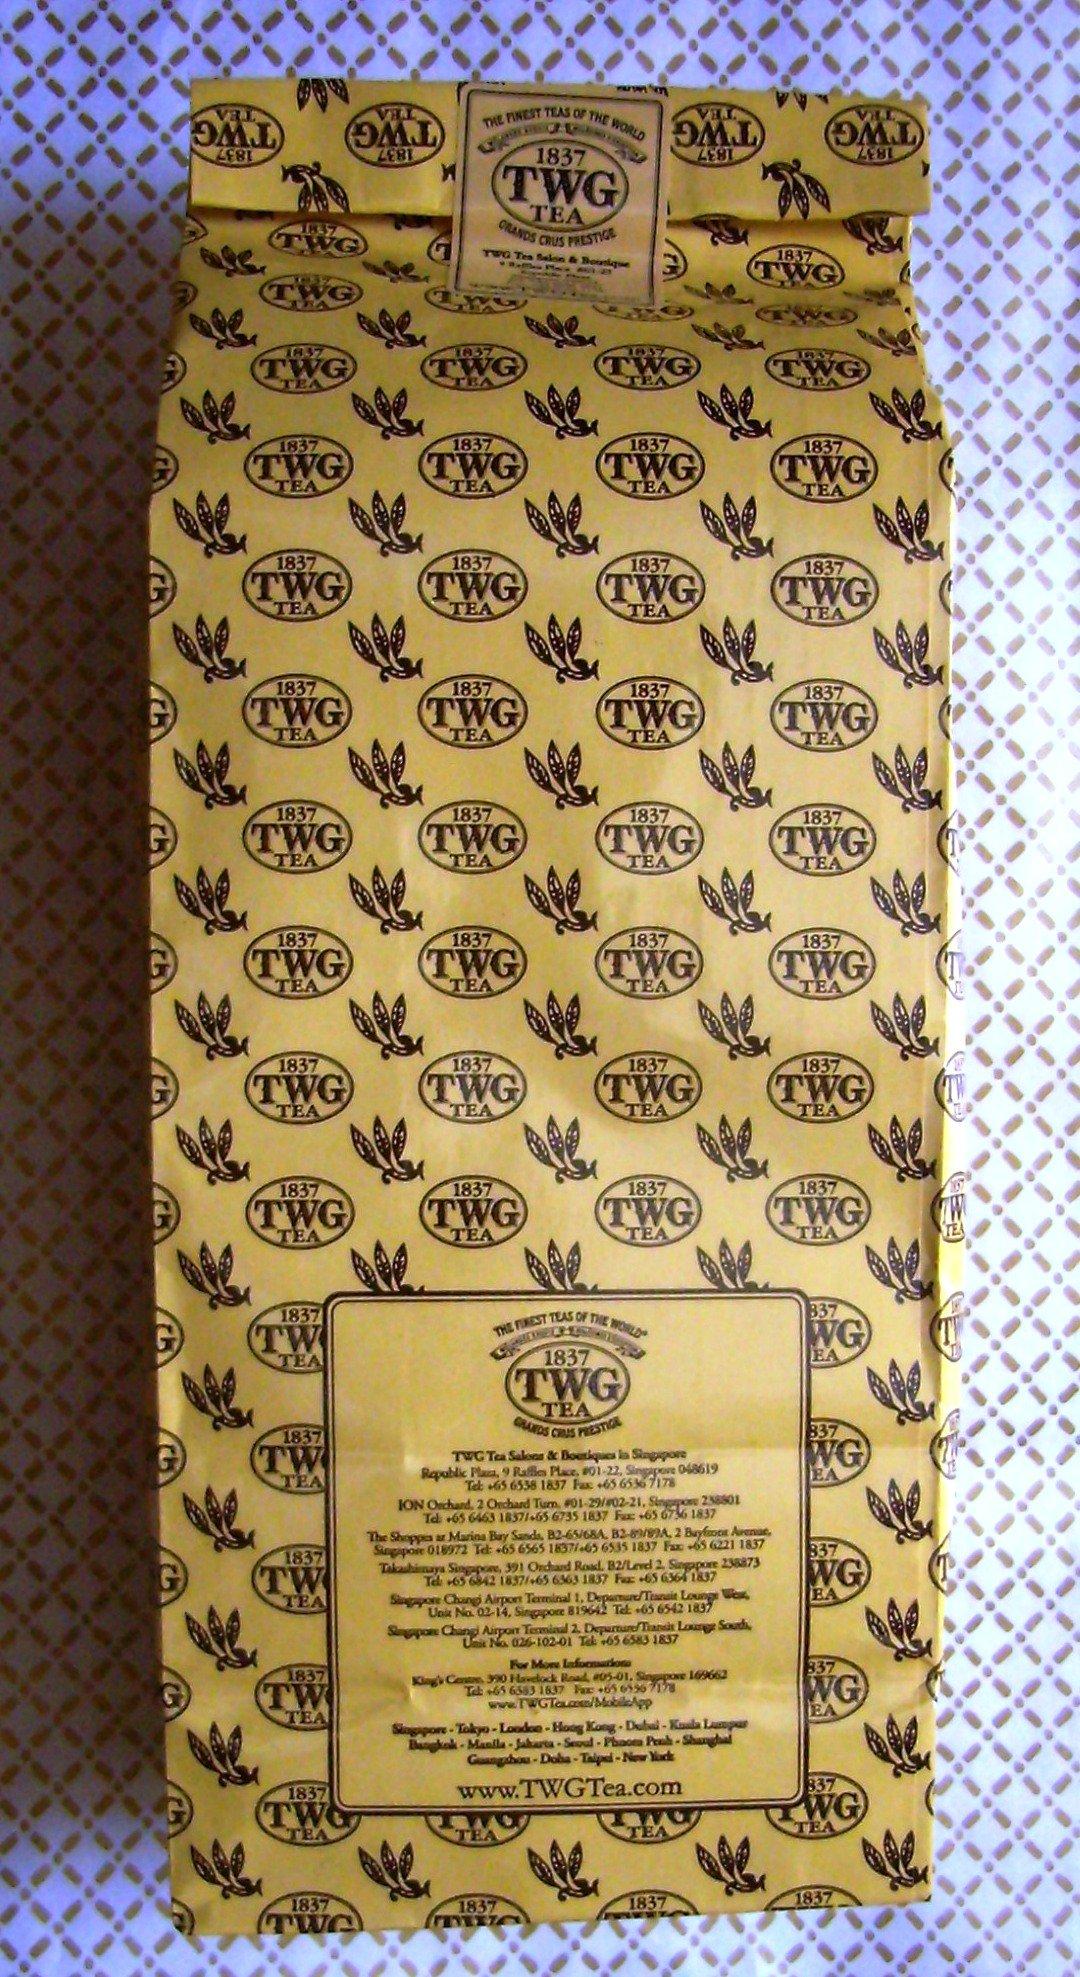 TWG Tea - Moroccan Mint Tea (TWGT4006) - 17.63oz / 500gr Loose Leaf BULK BAG by Unknown (Image #2)